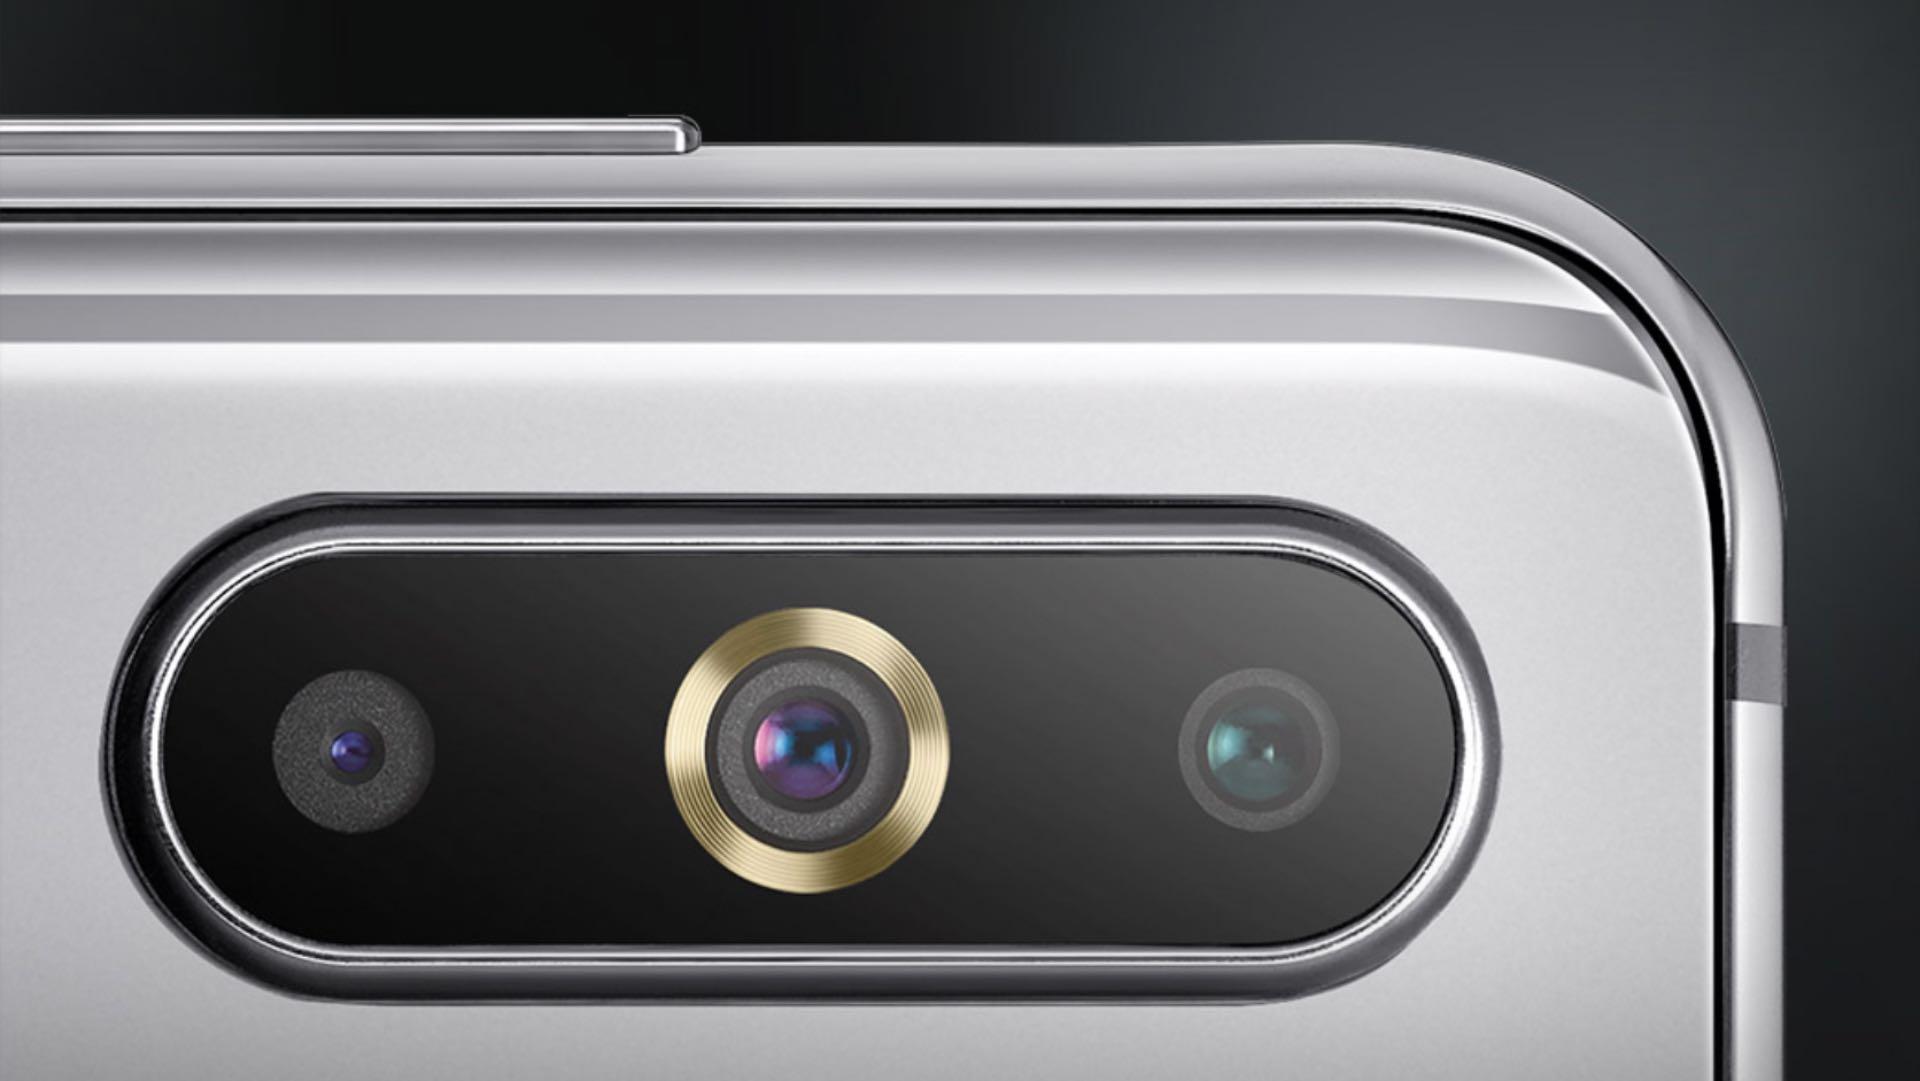 SamsungGalaxy A8s: перший смартфон компанії з екраном Infinity-O